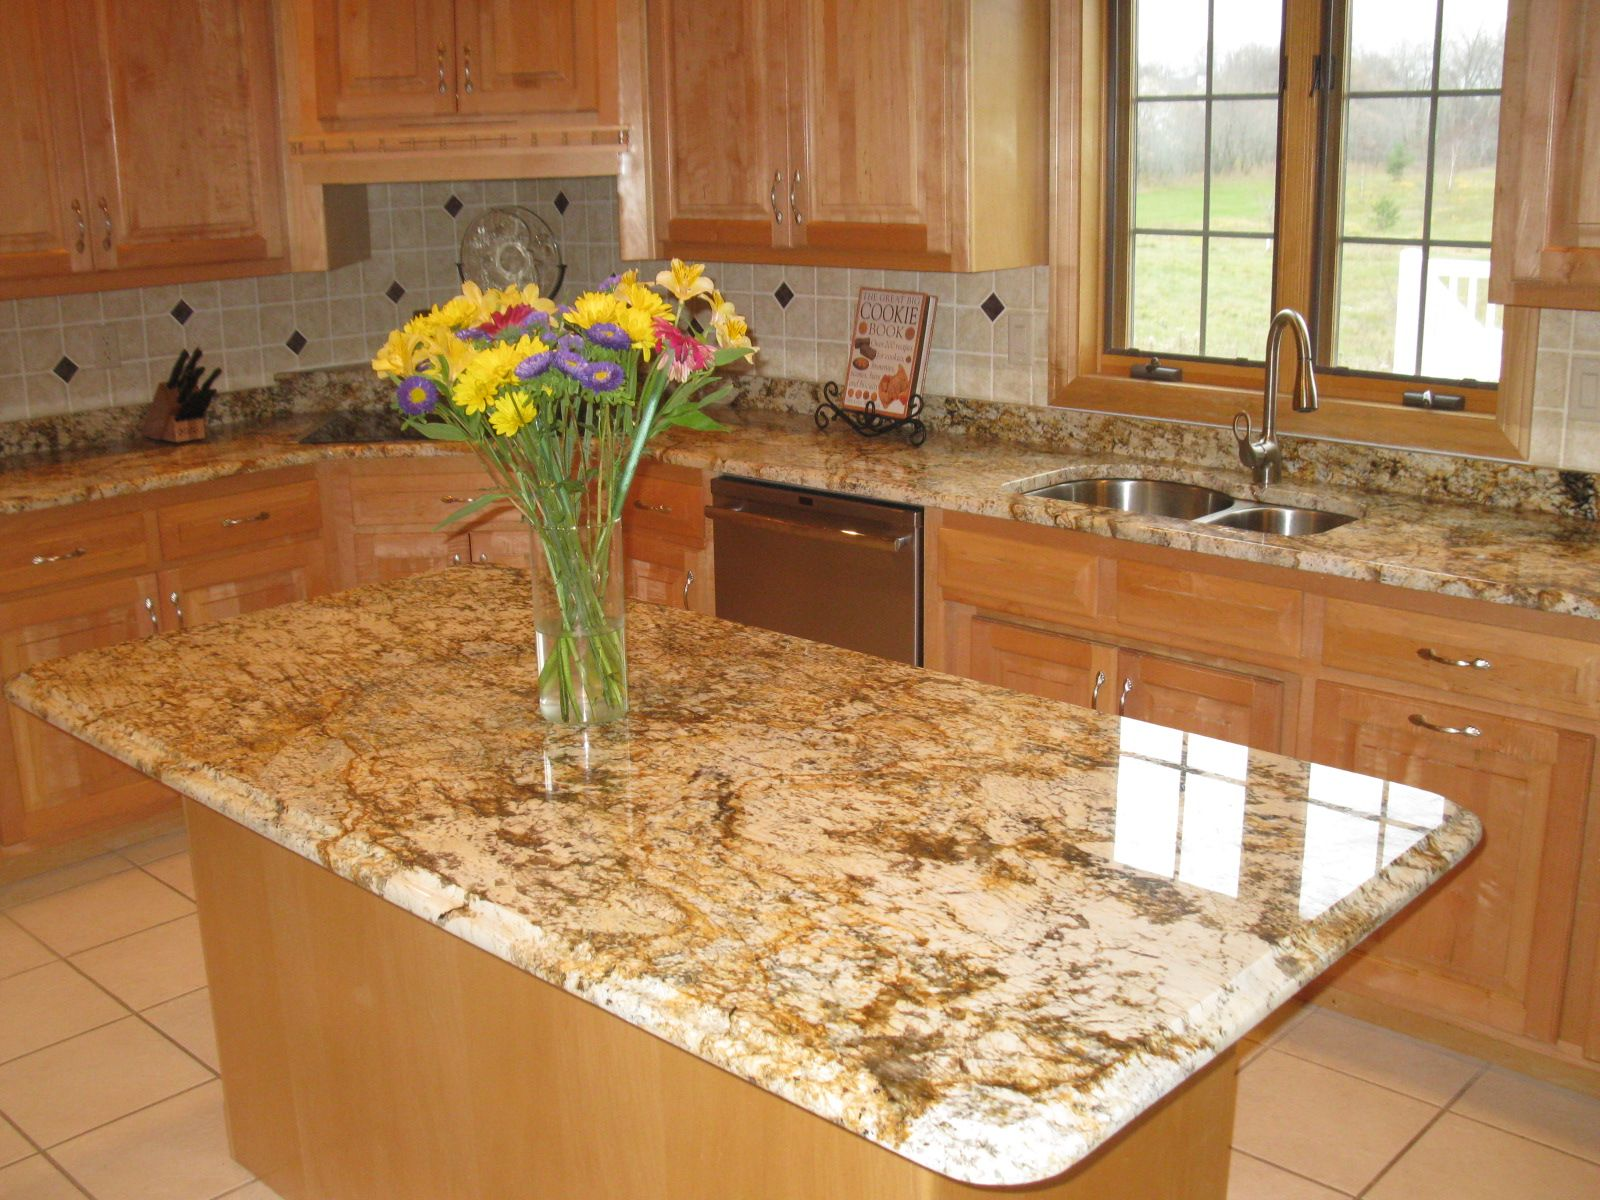 geriba beach granite - Google Search | Updated kitchen ...